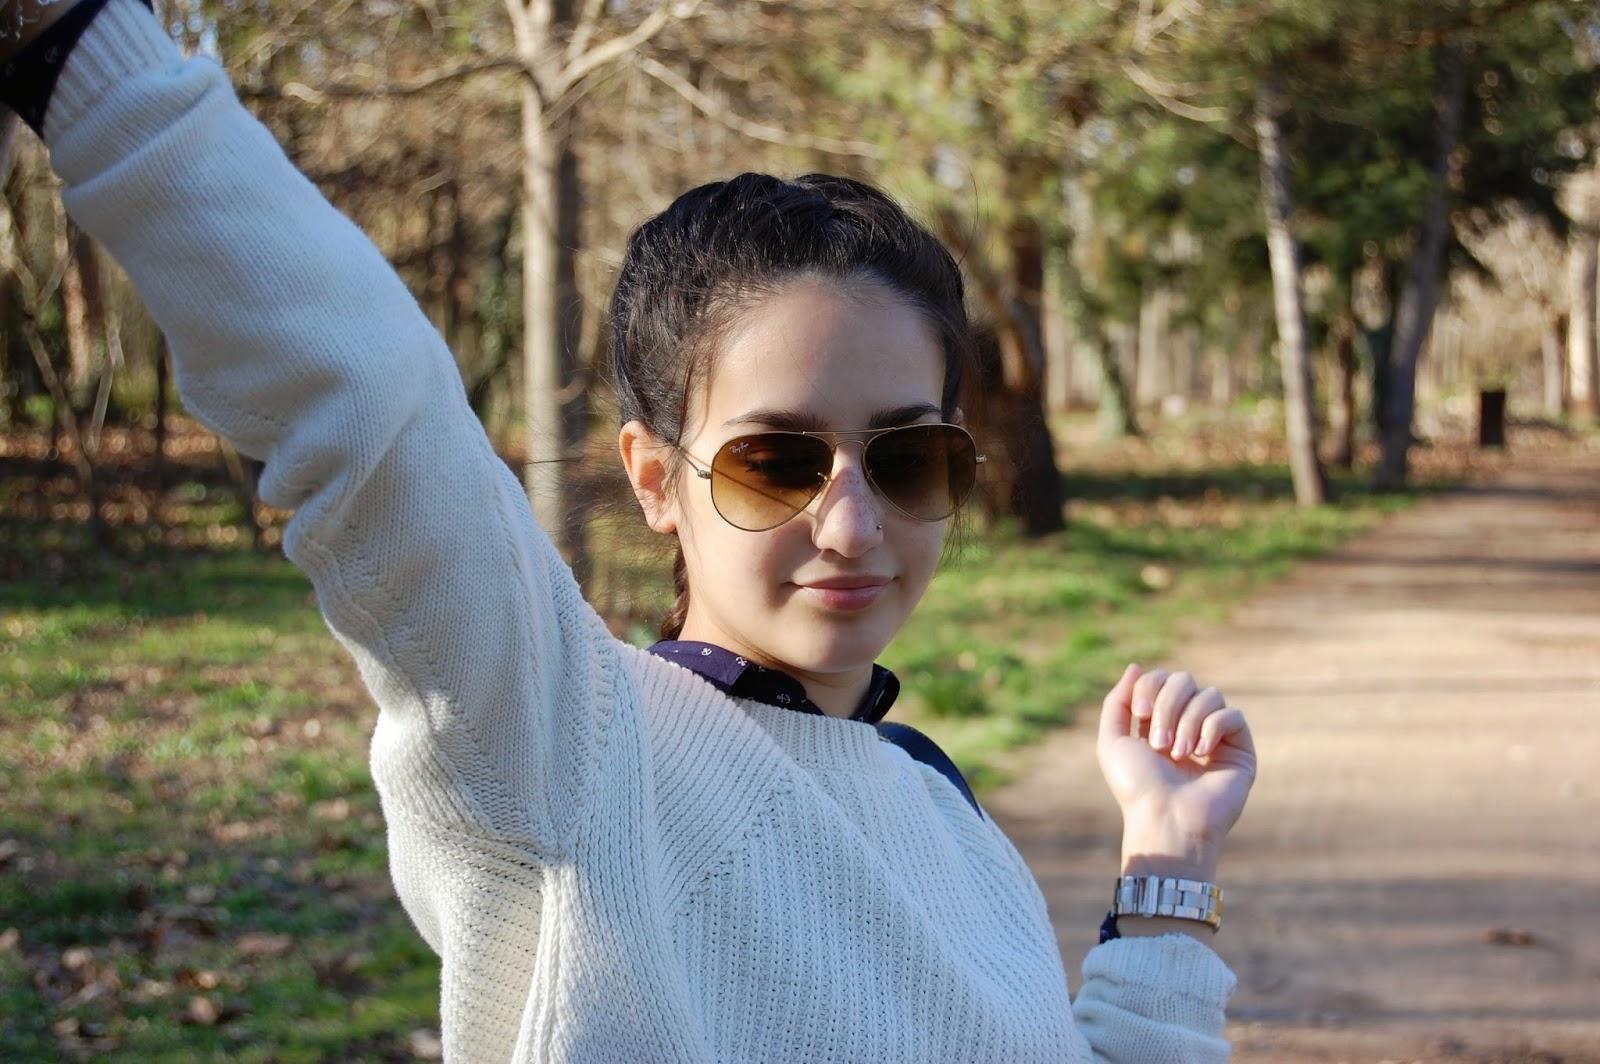 cazadora denim zara, jersey blanco mango, camisa azul zara, leggings azul marino zara, new balance negras, bolso bimba&lola beige, ray-ban aviator